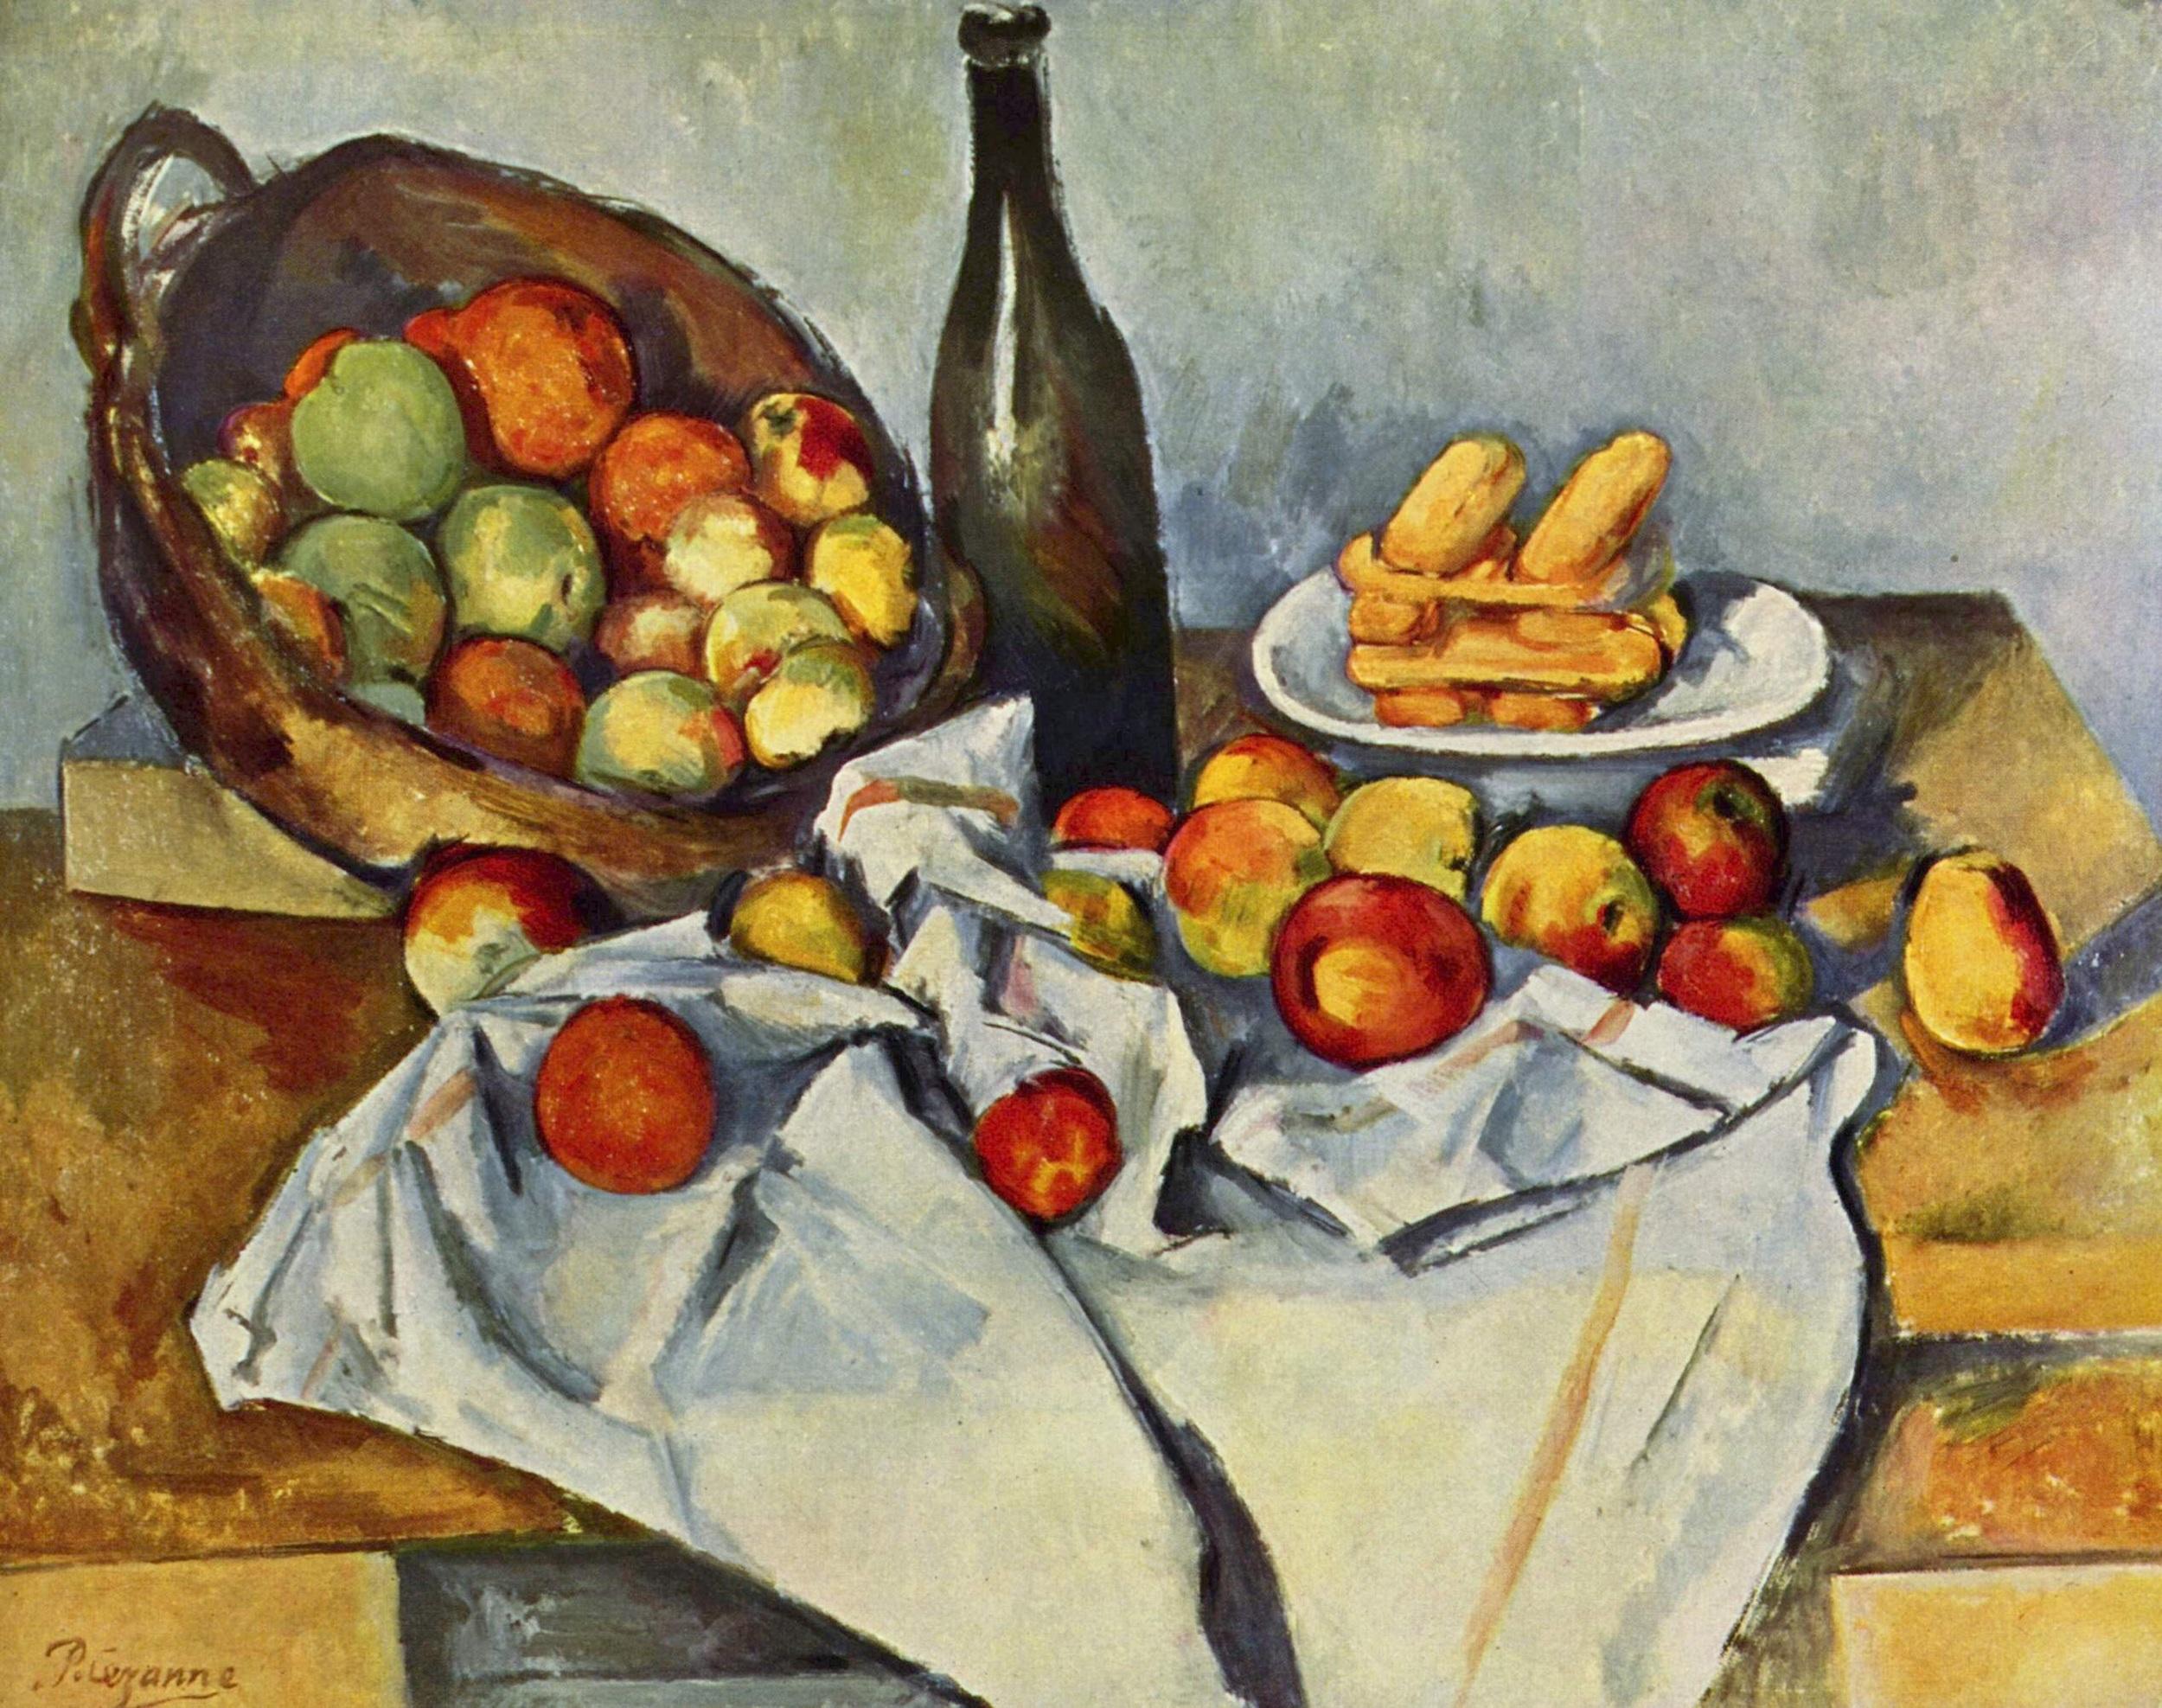 Basket of apples - Paul Cézanne